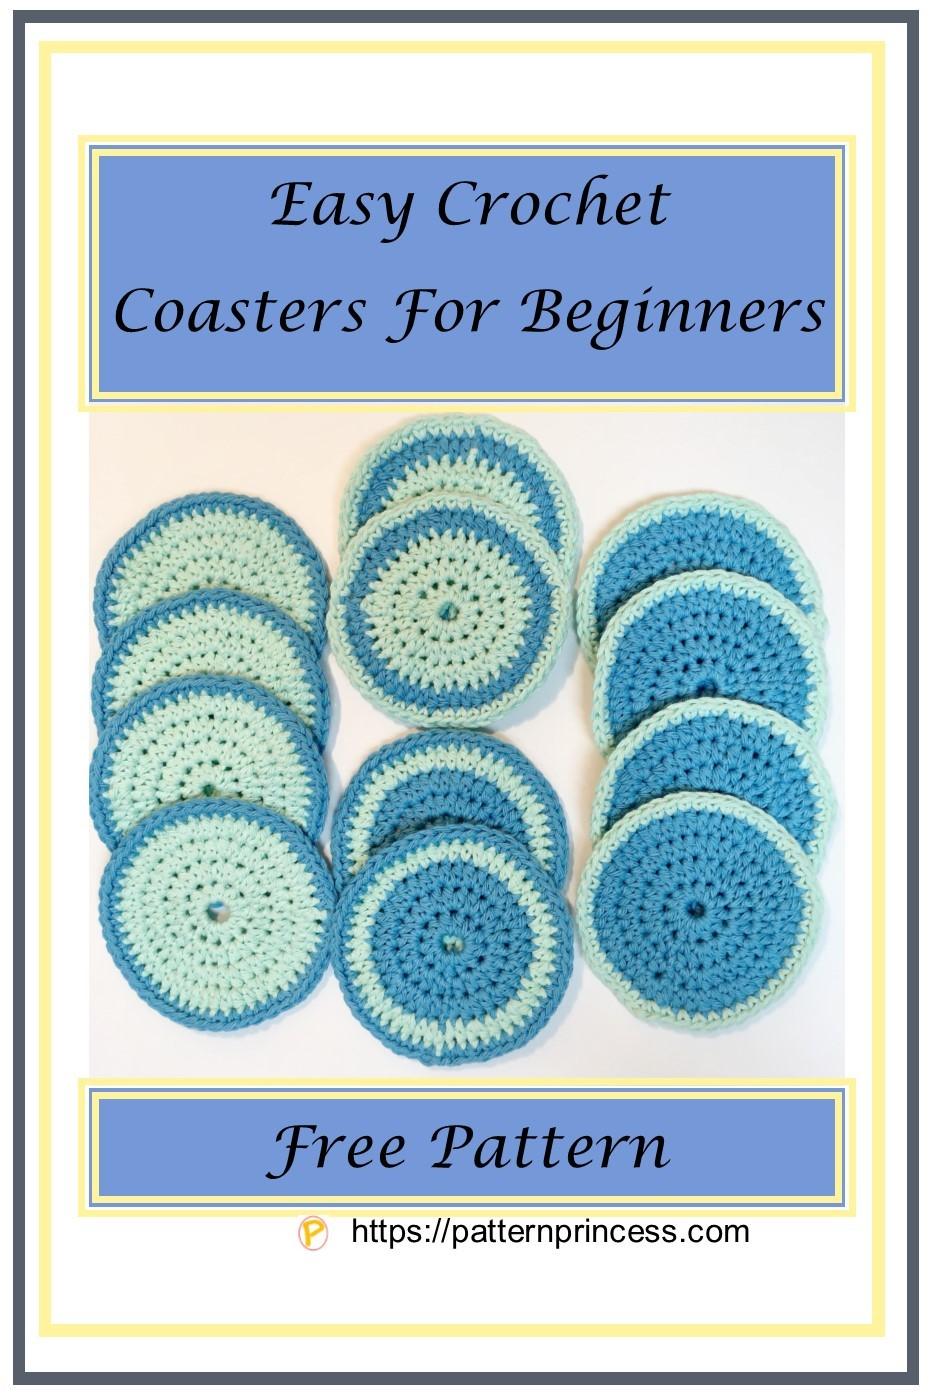 Easy Crochet Coasters for Beginners